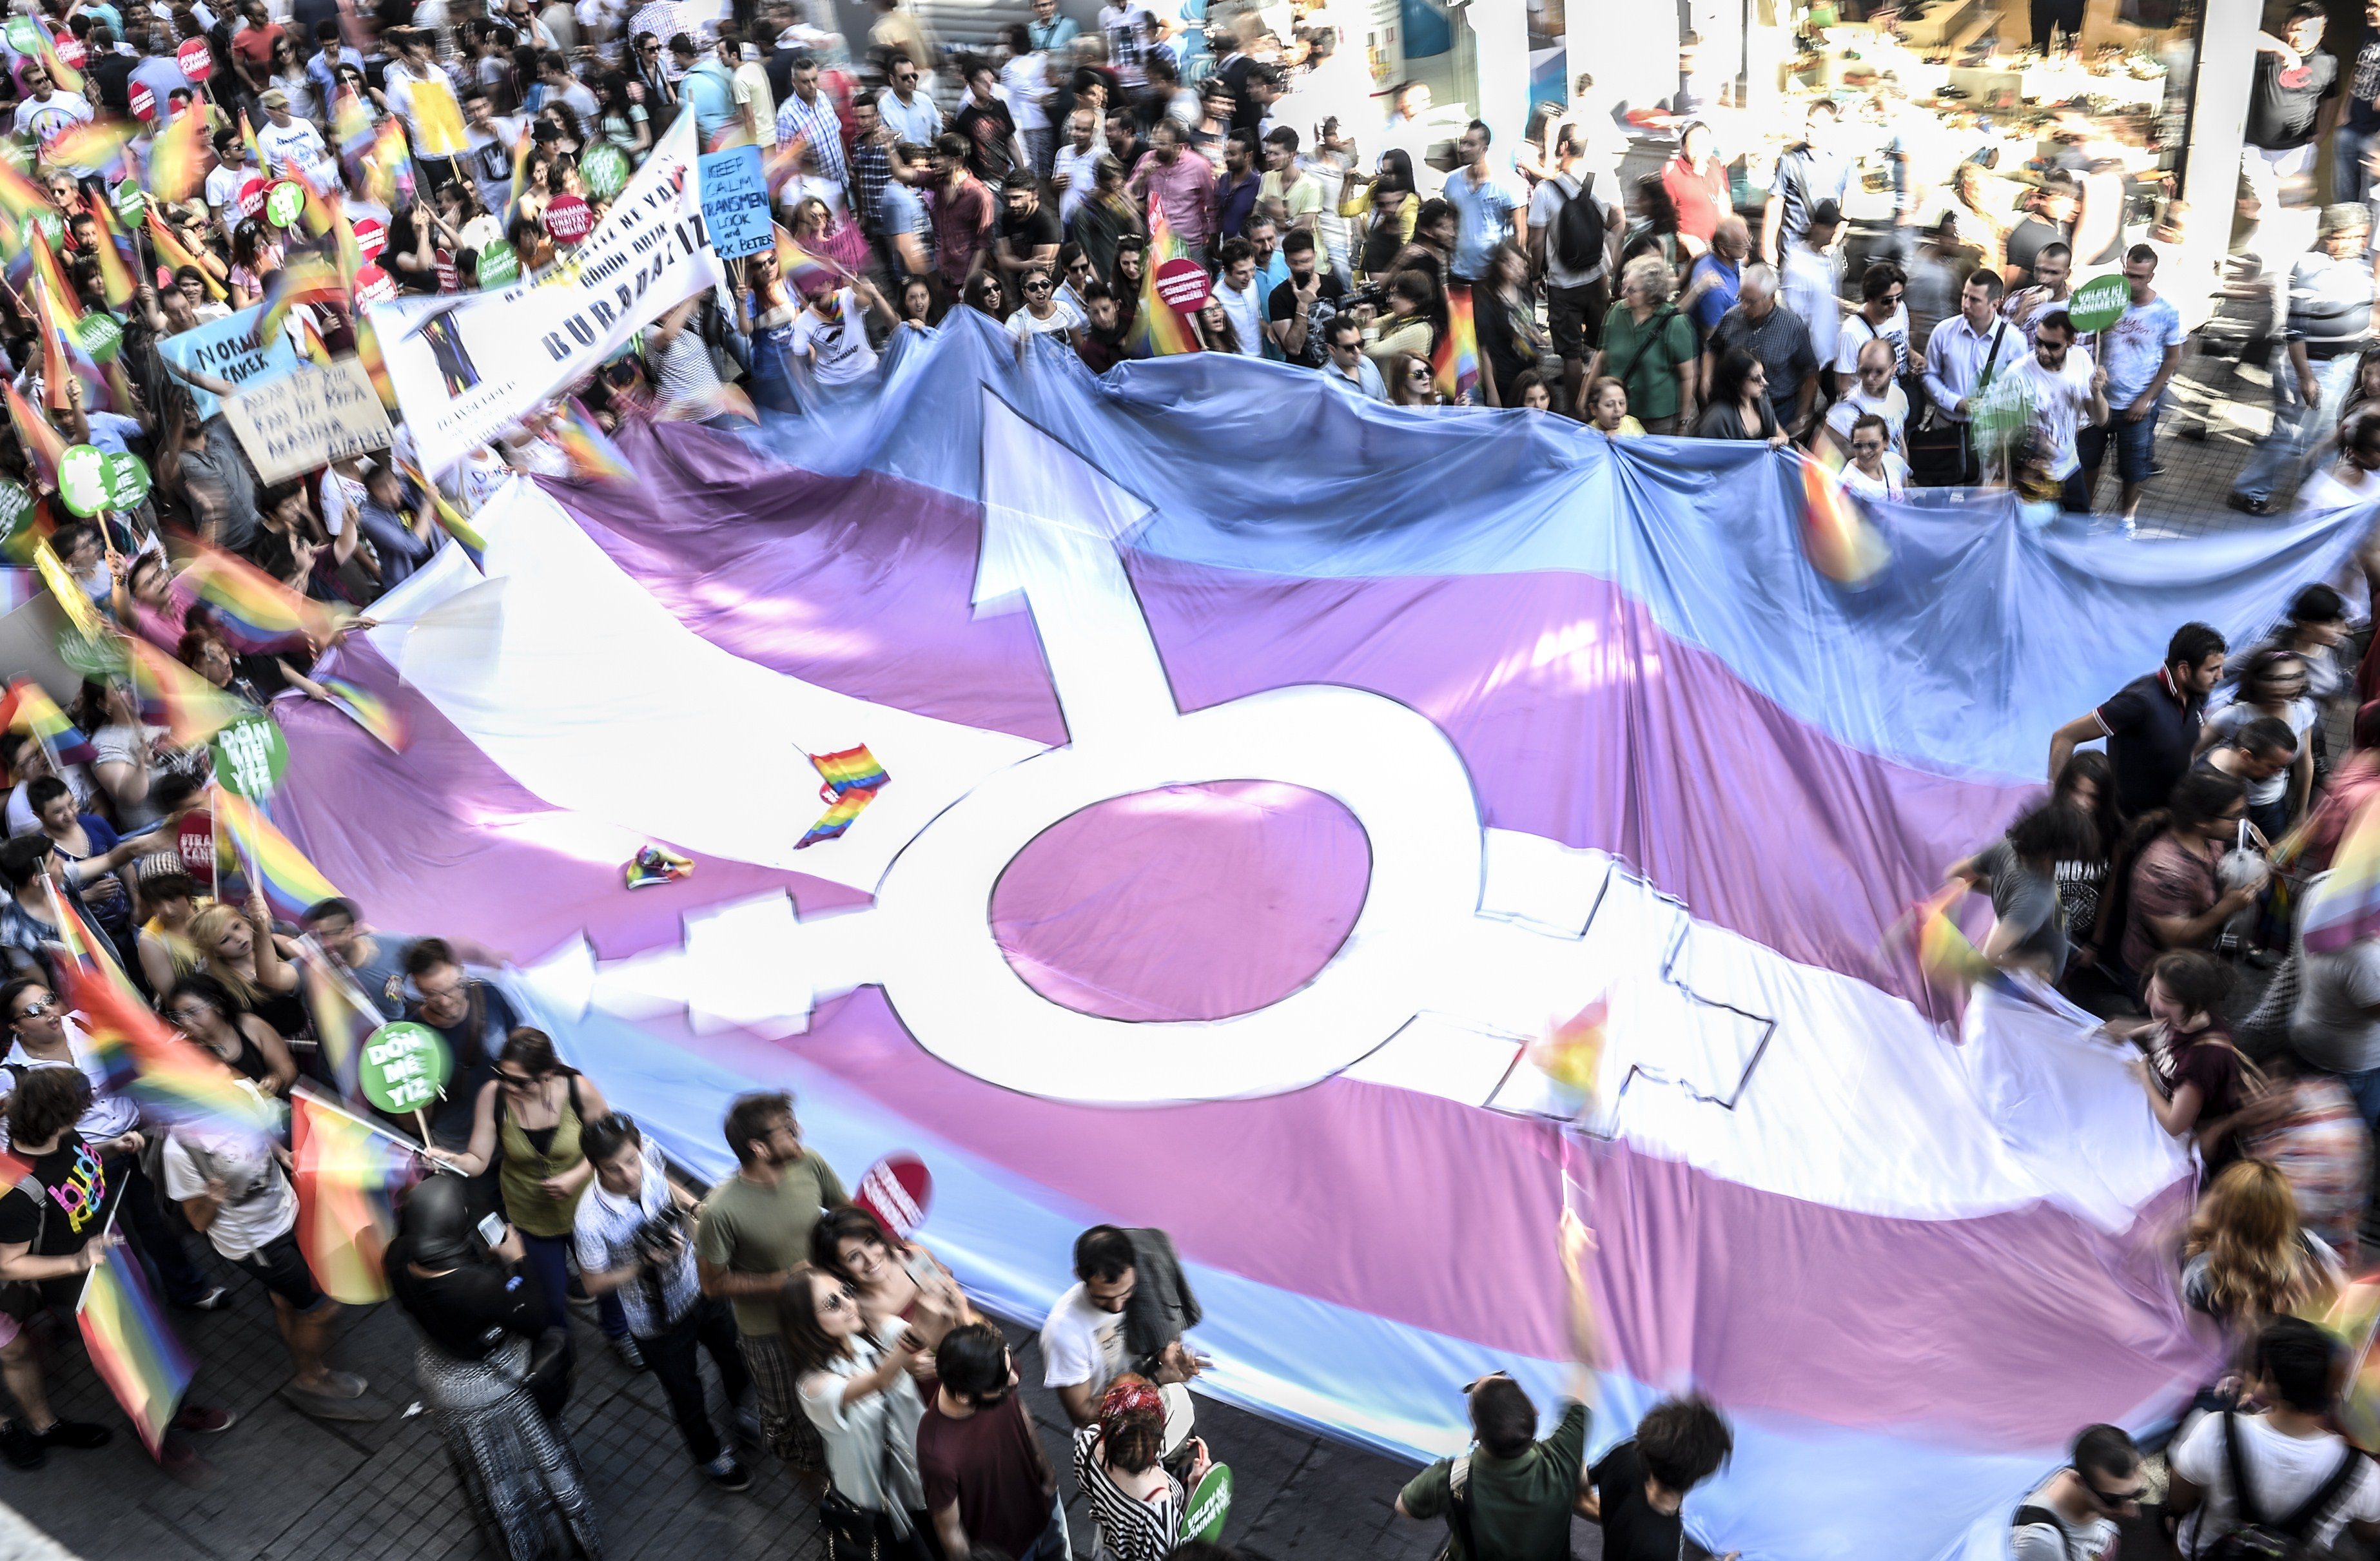 Report Highlights Experiences of Black Transgender People in U.S.